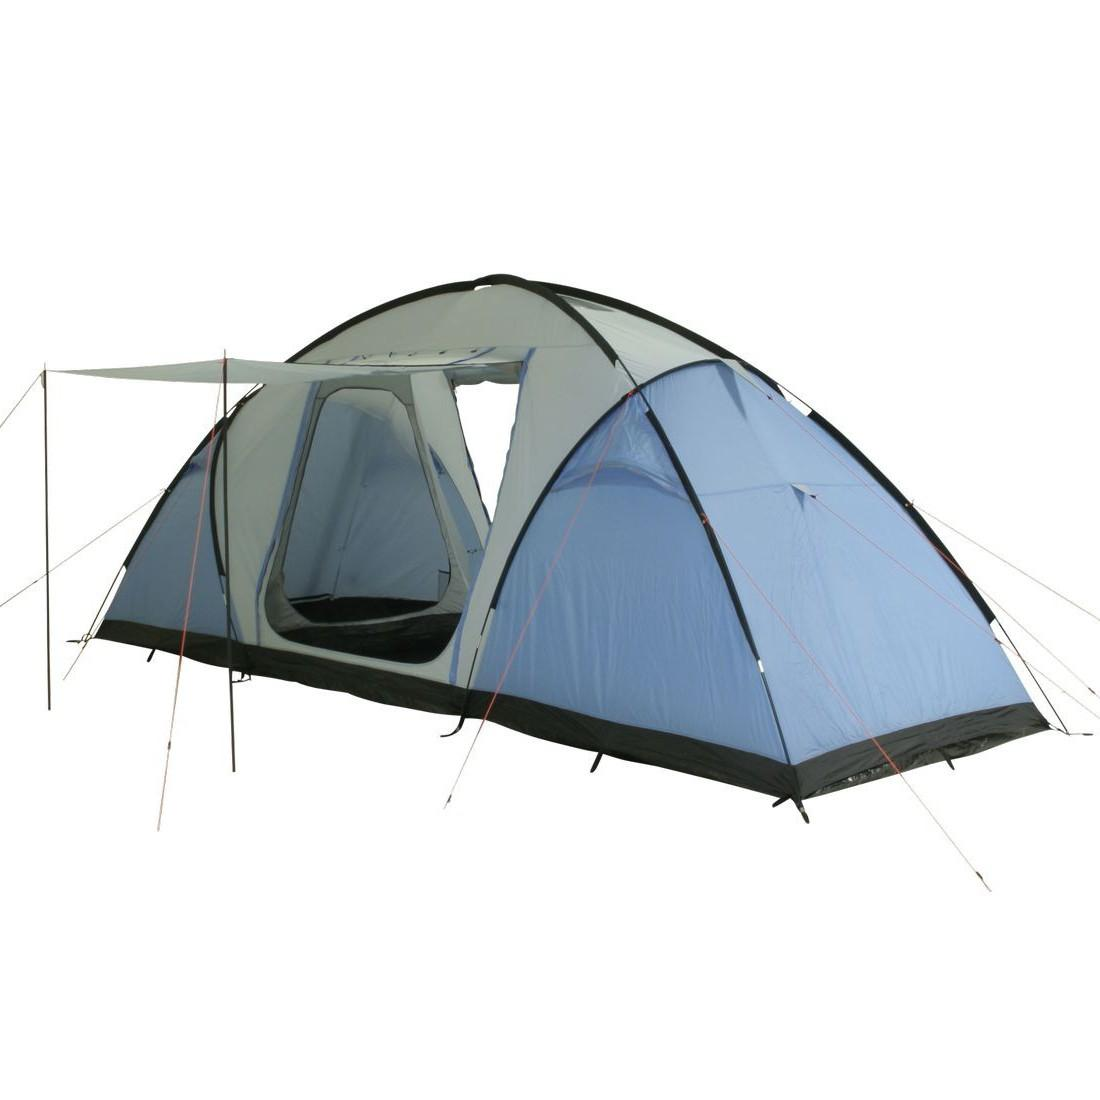 Zelt Weston 4 : T camping zelt weston vis a tunnelzelt mit